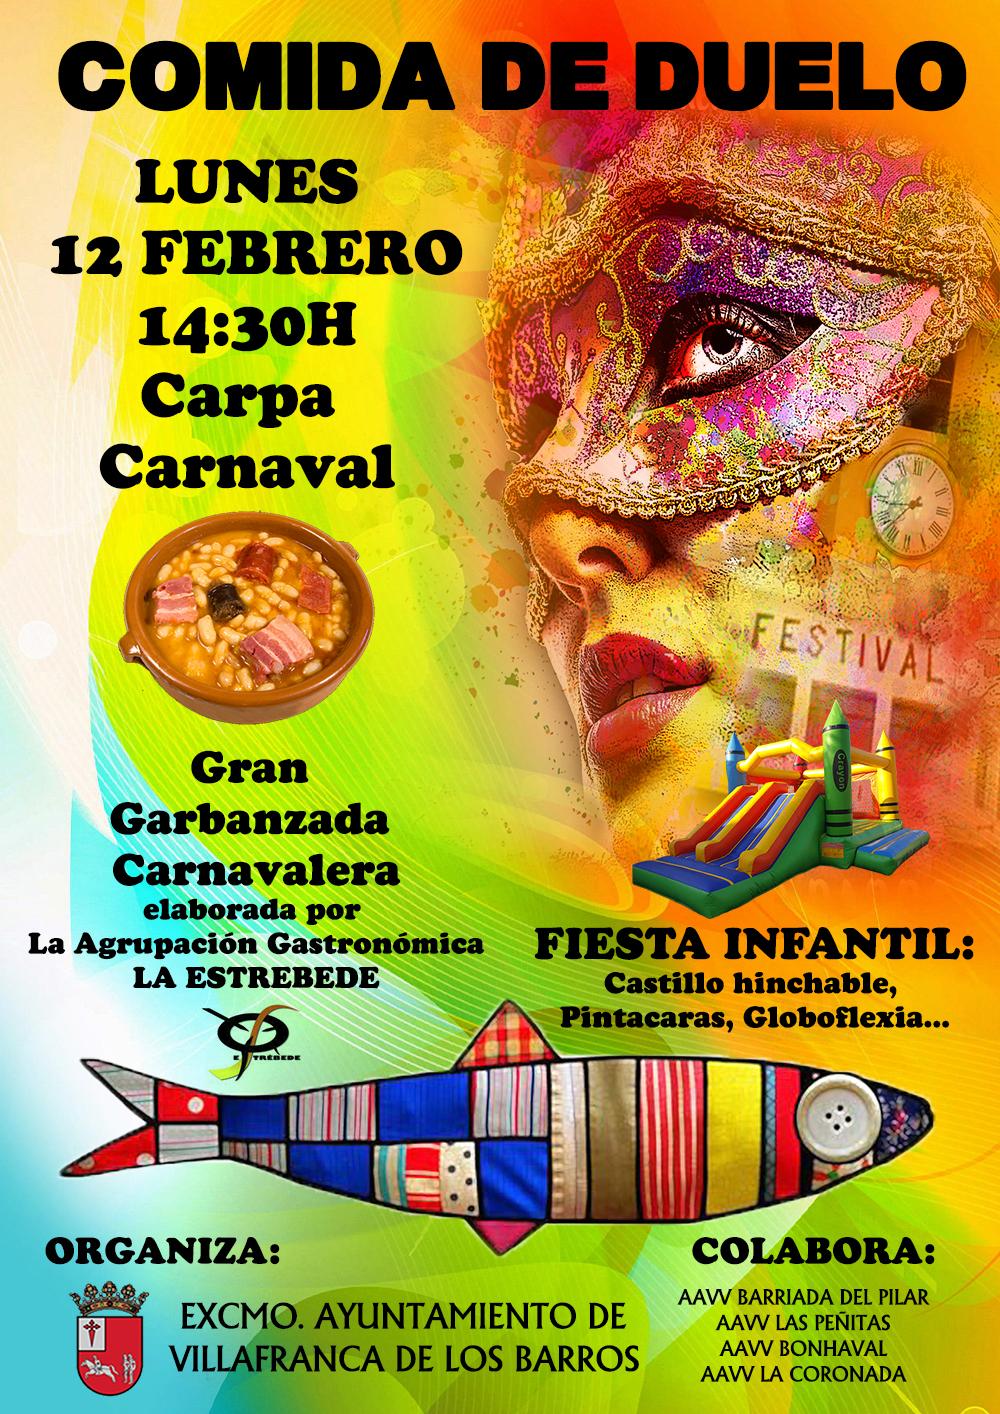 La carpa del carnaval de villafranca acoger el lunes 14 for Carpa comida